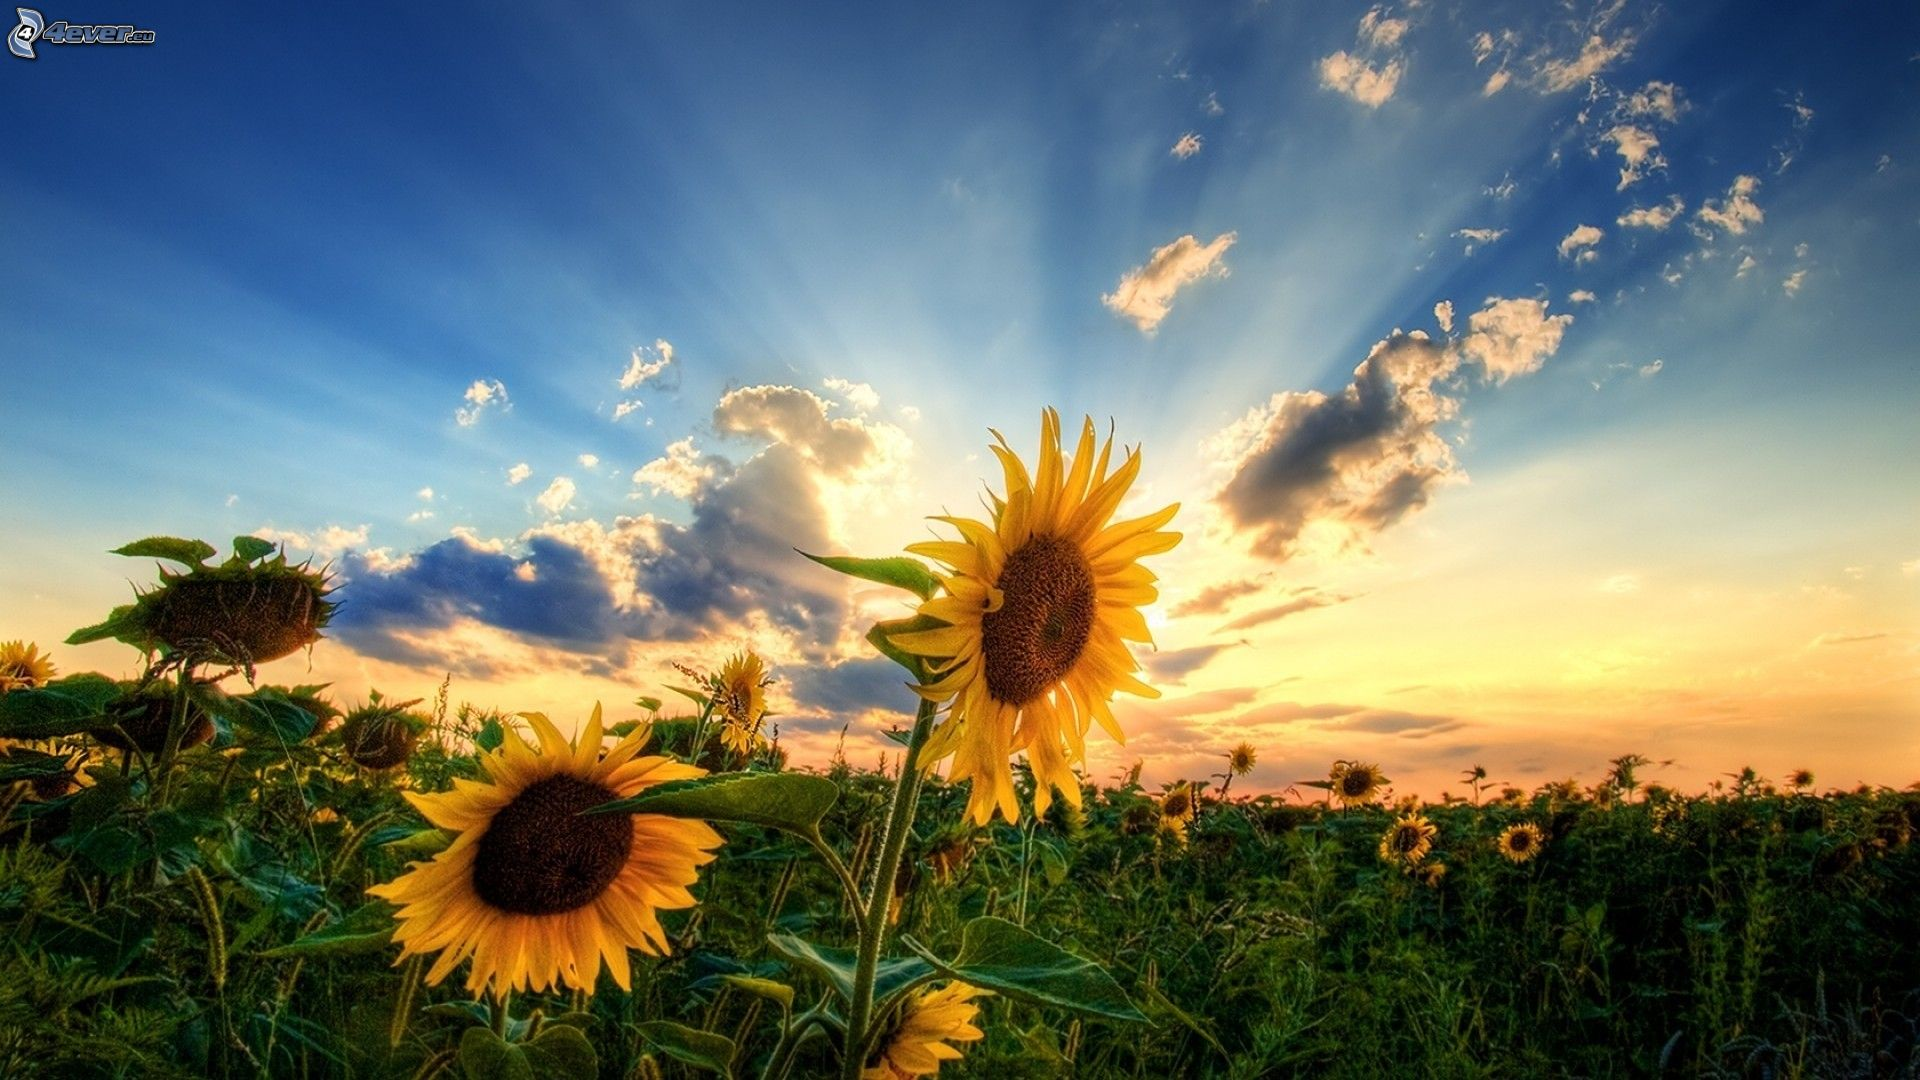 Suncokreti-sunflowers - Page 28 Sonnen11